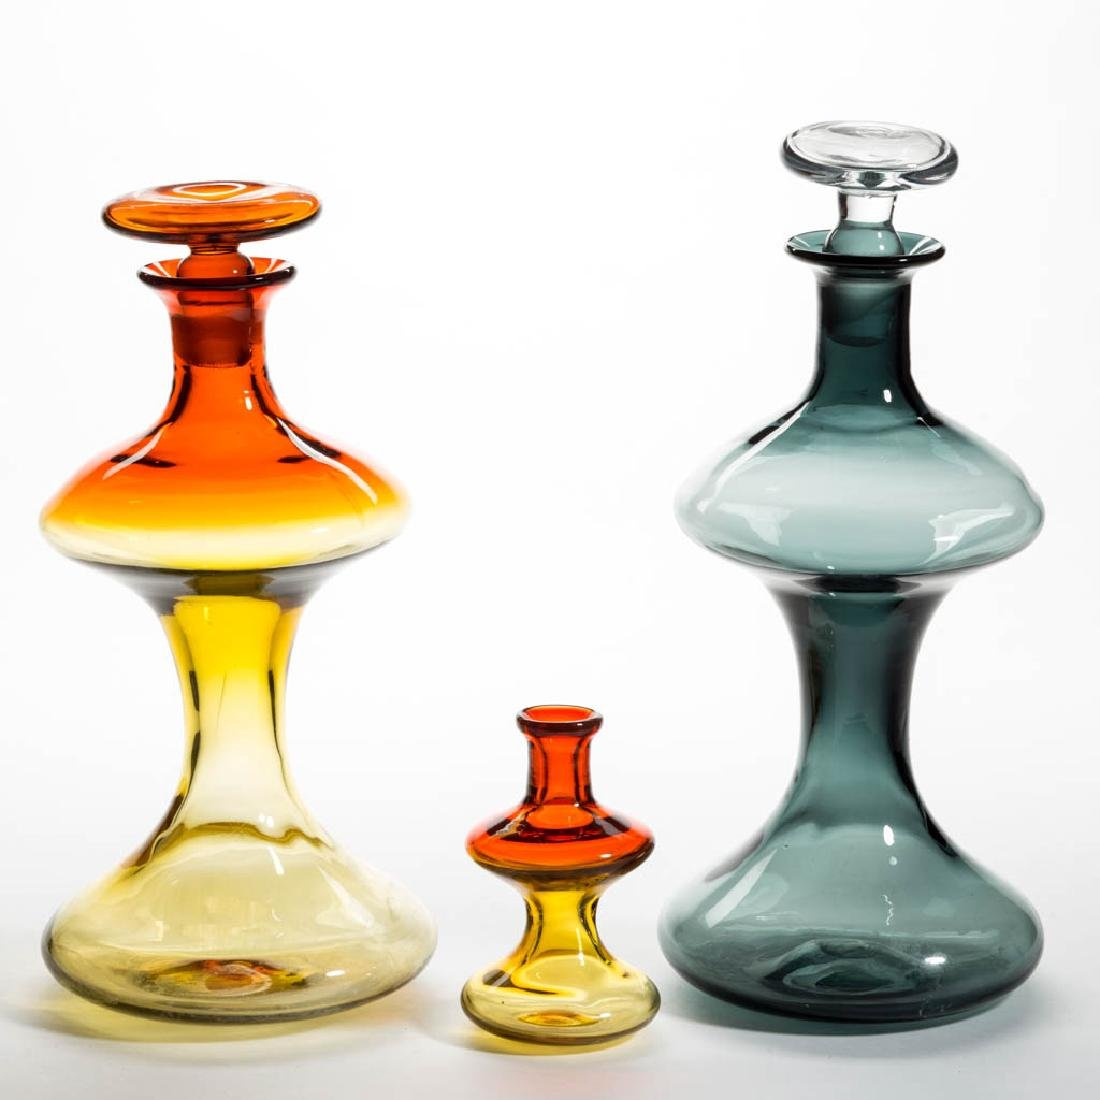 BLENKO NO. 5719 GLASS - WAYNE HUSTED MUSHROOM